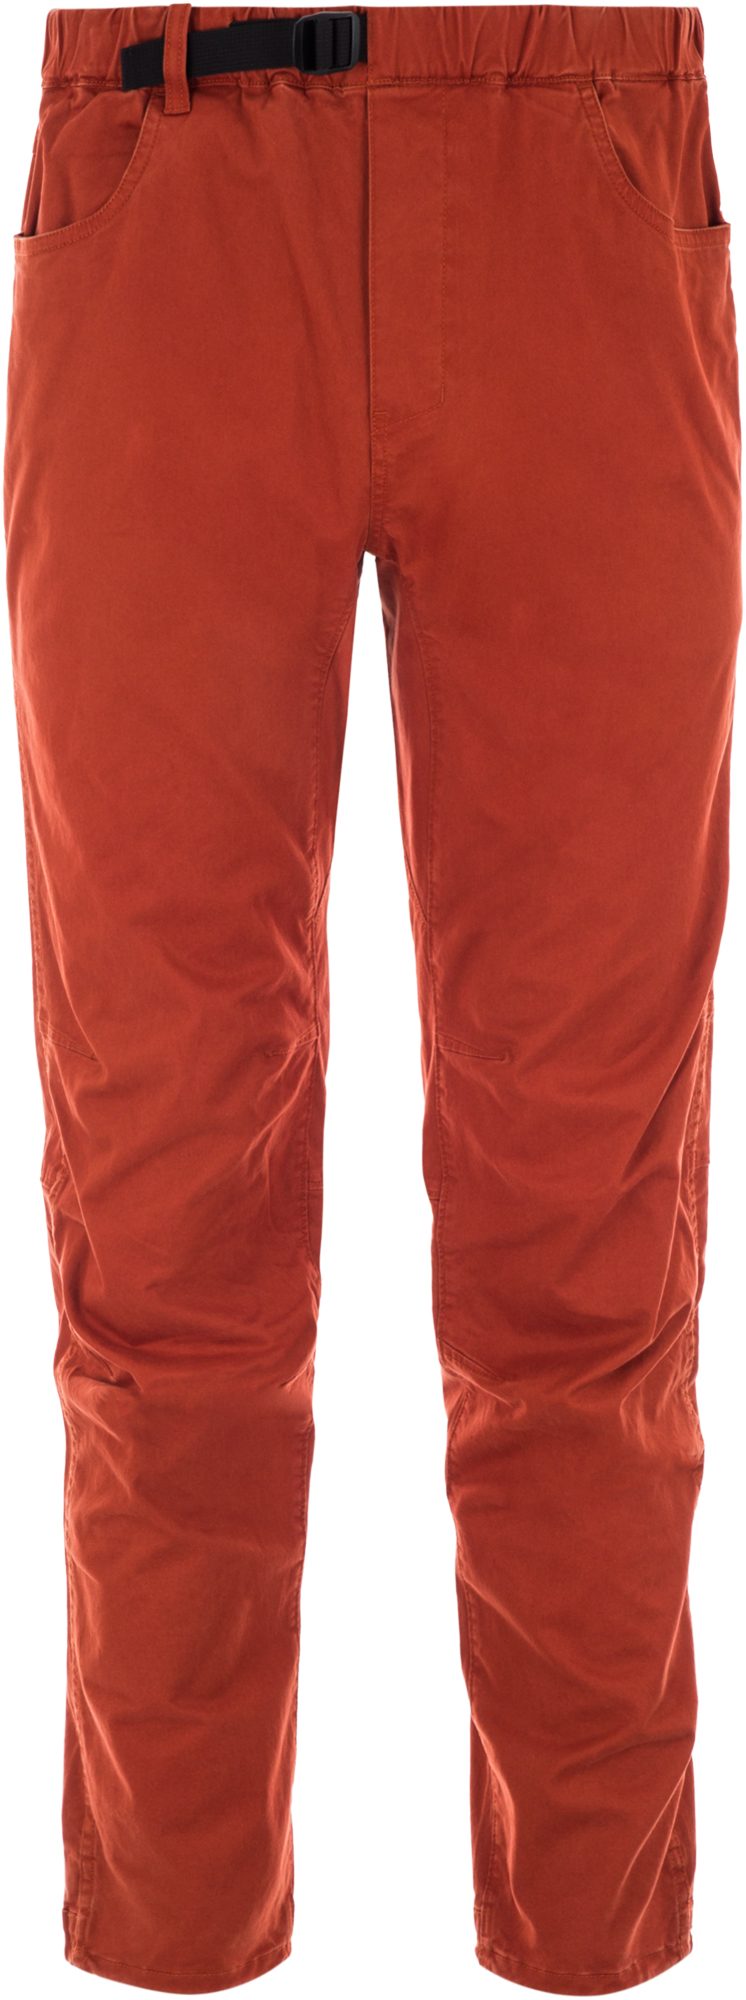 Mountain Hardwear Брюки мужские Mountain Hardwear Cederberg Pull On, размер 54